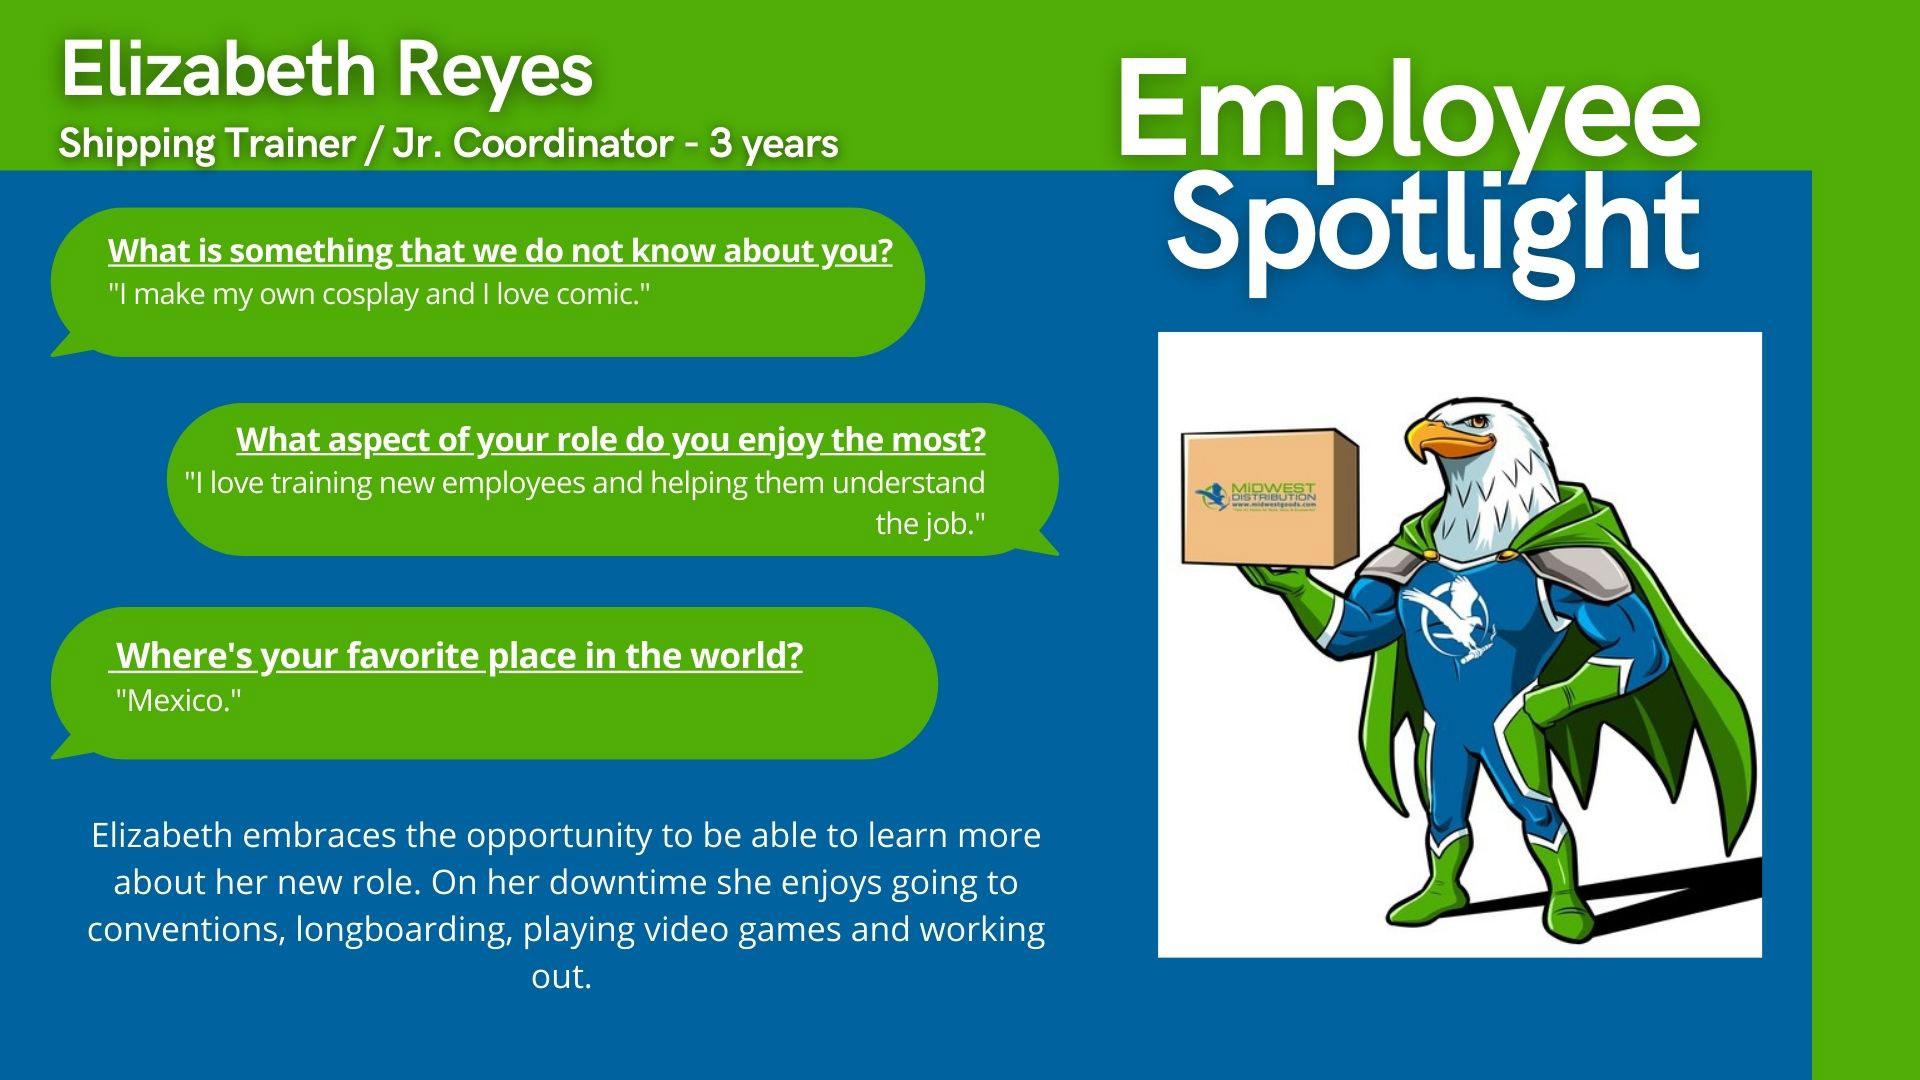 August 2021 Midwest Employee Spotlight